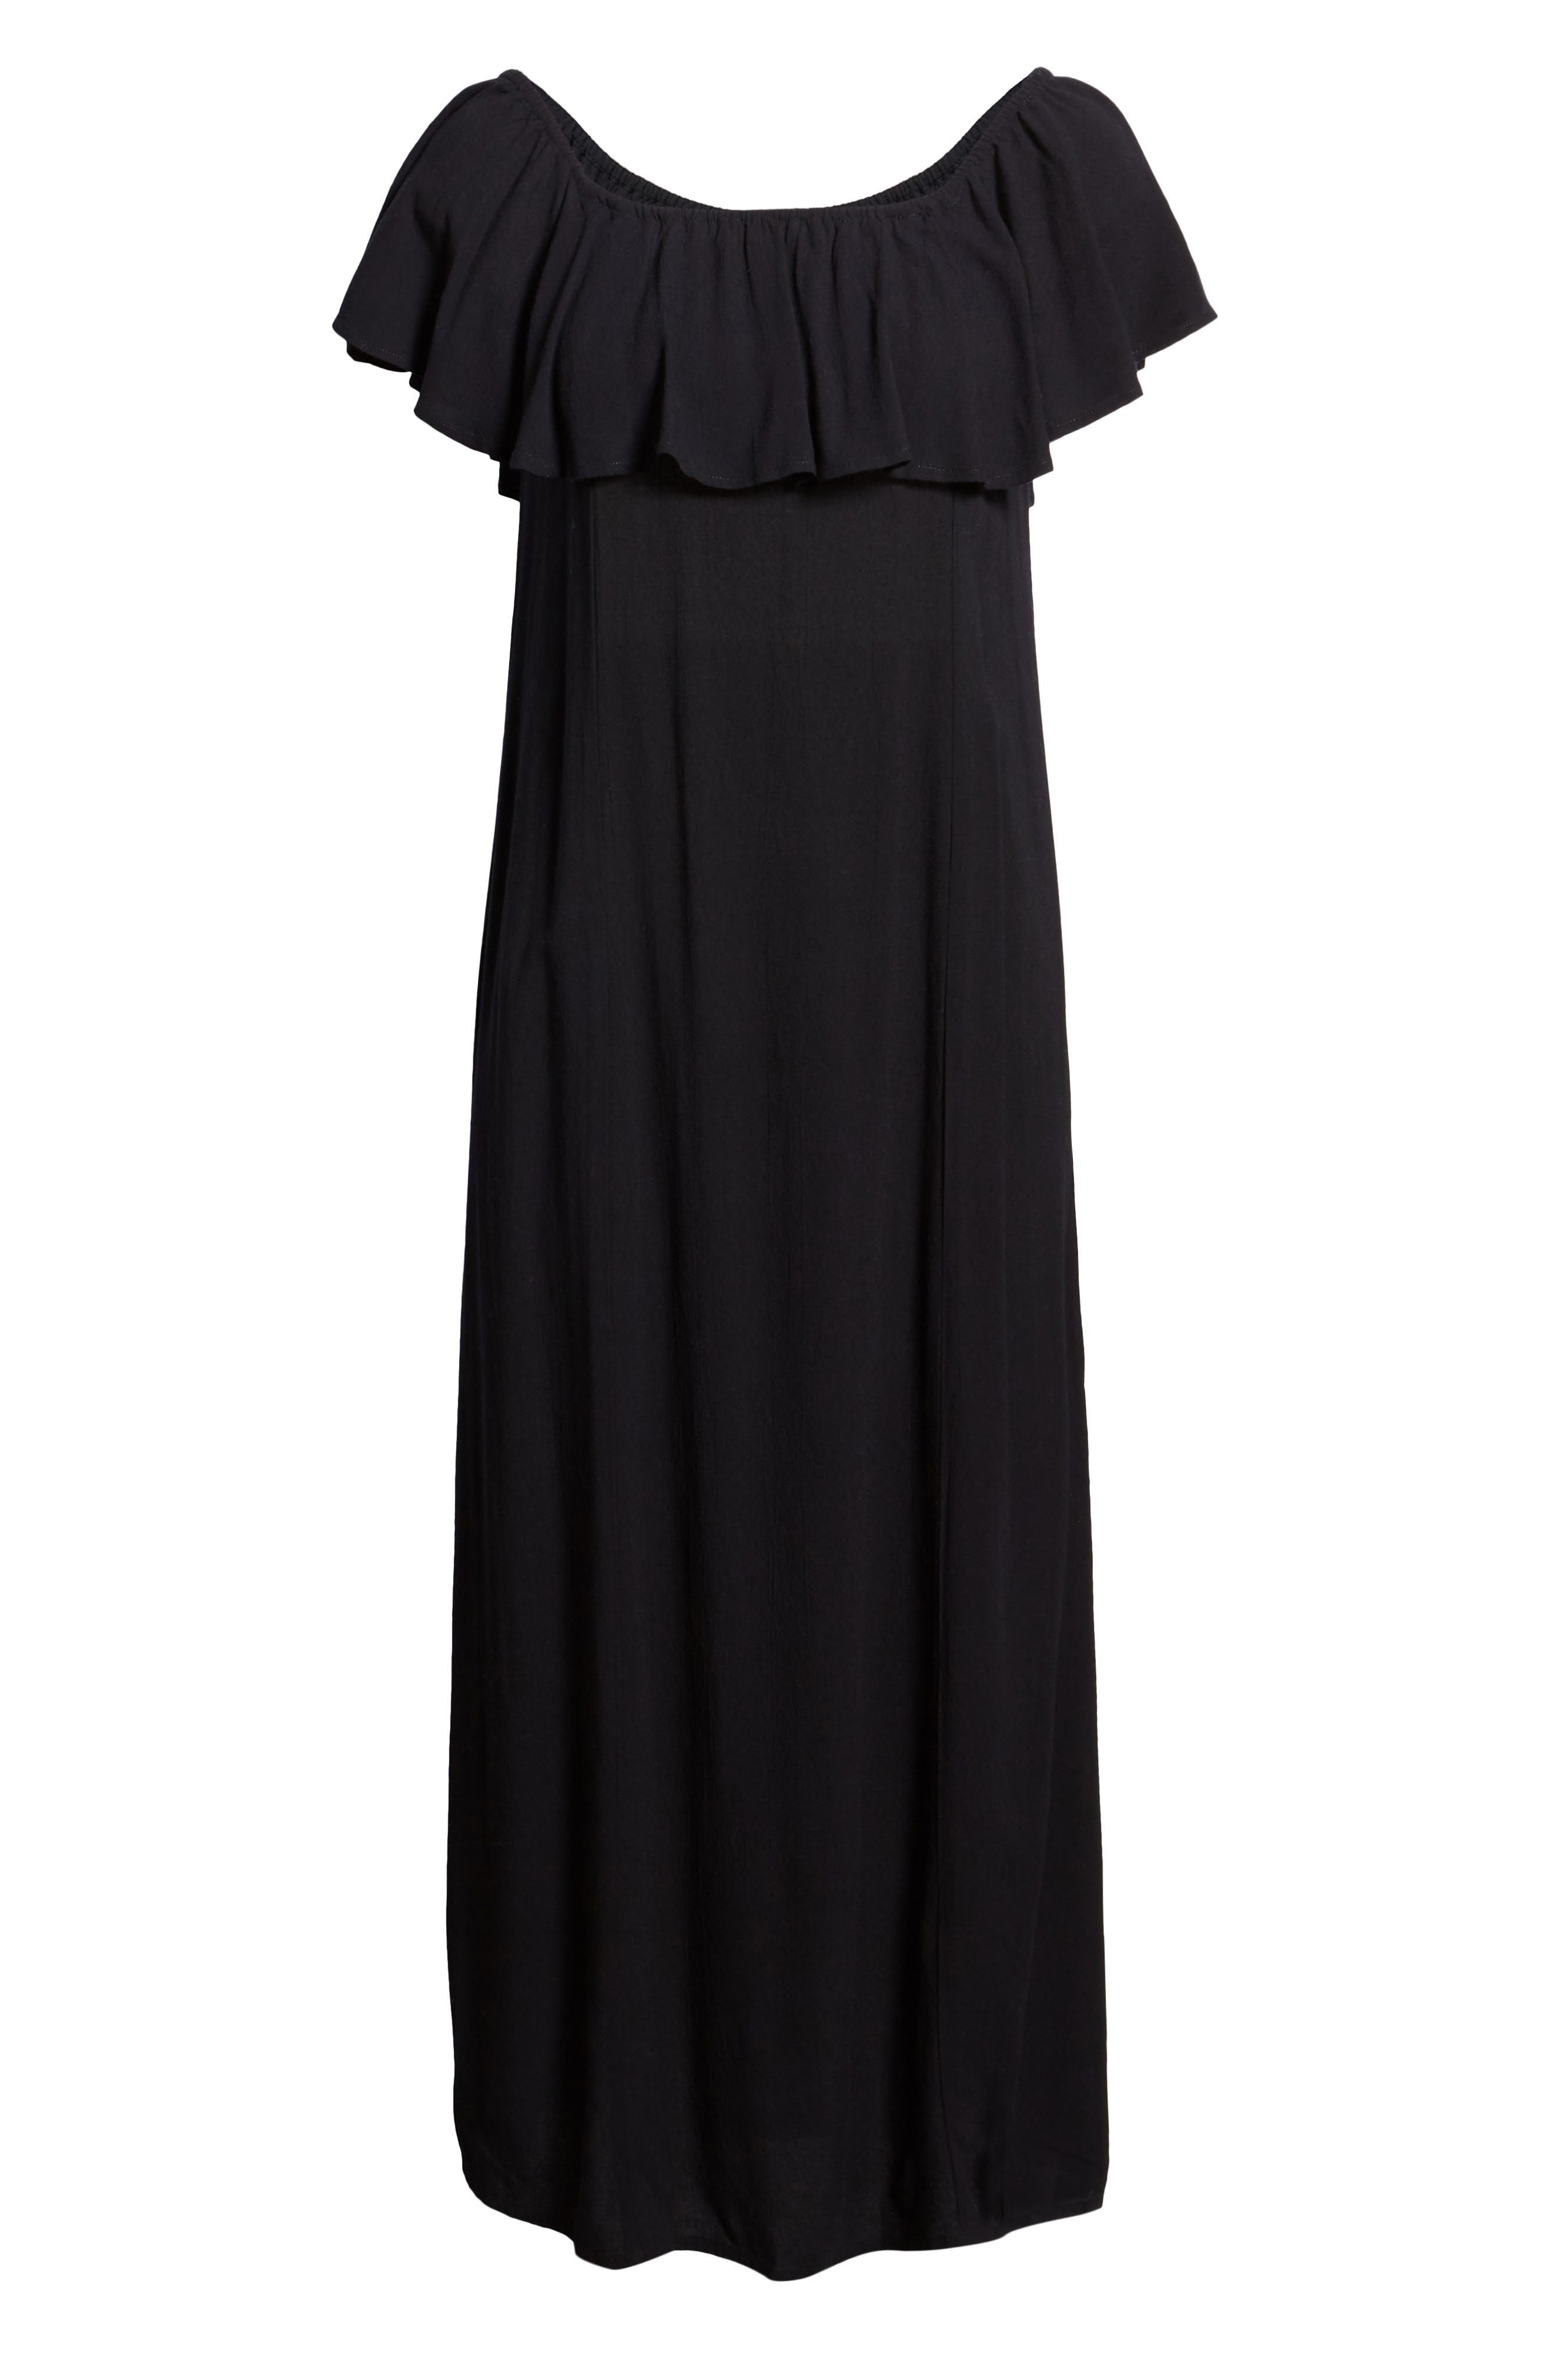 Vista Del Valle Off the Shoulder Ruffle Maxi Dress,                             Alternate thumbnail 8, color,                             001